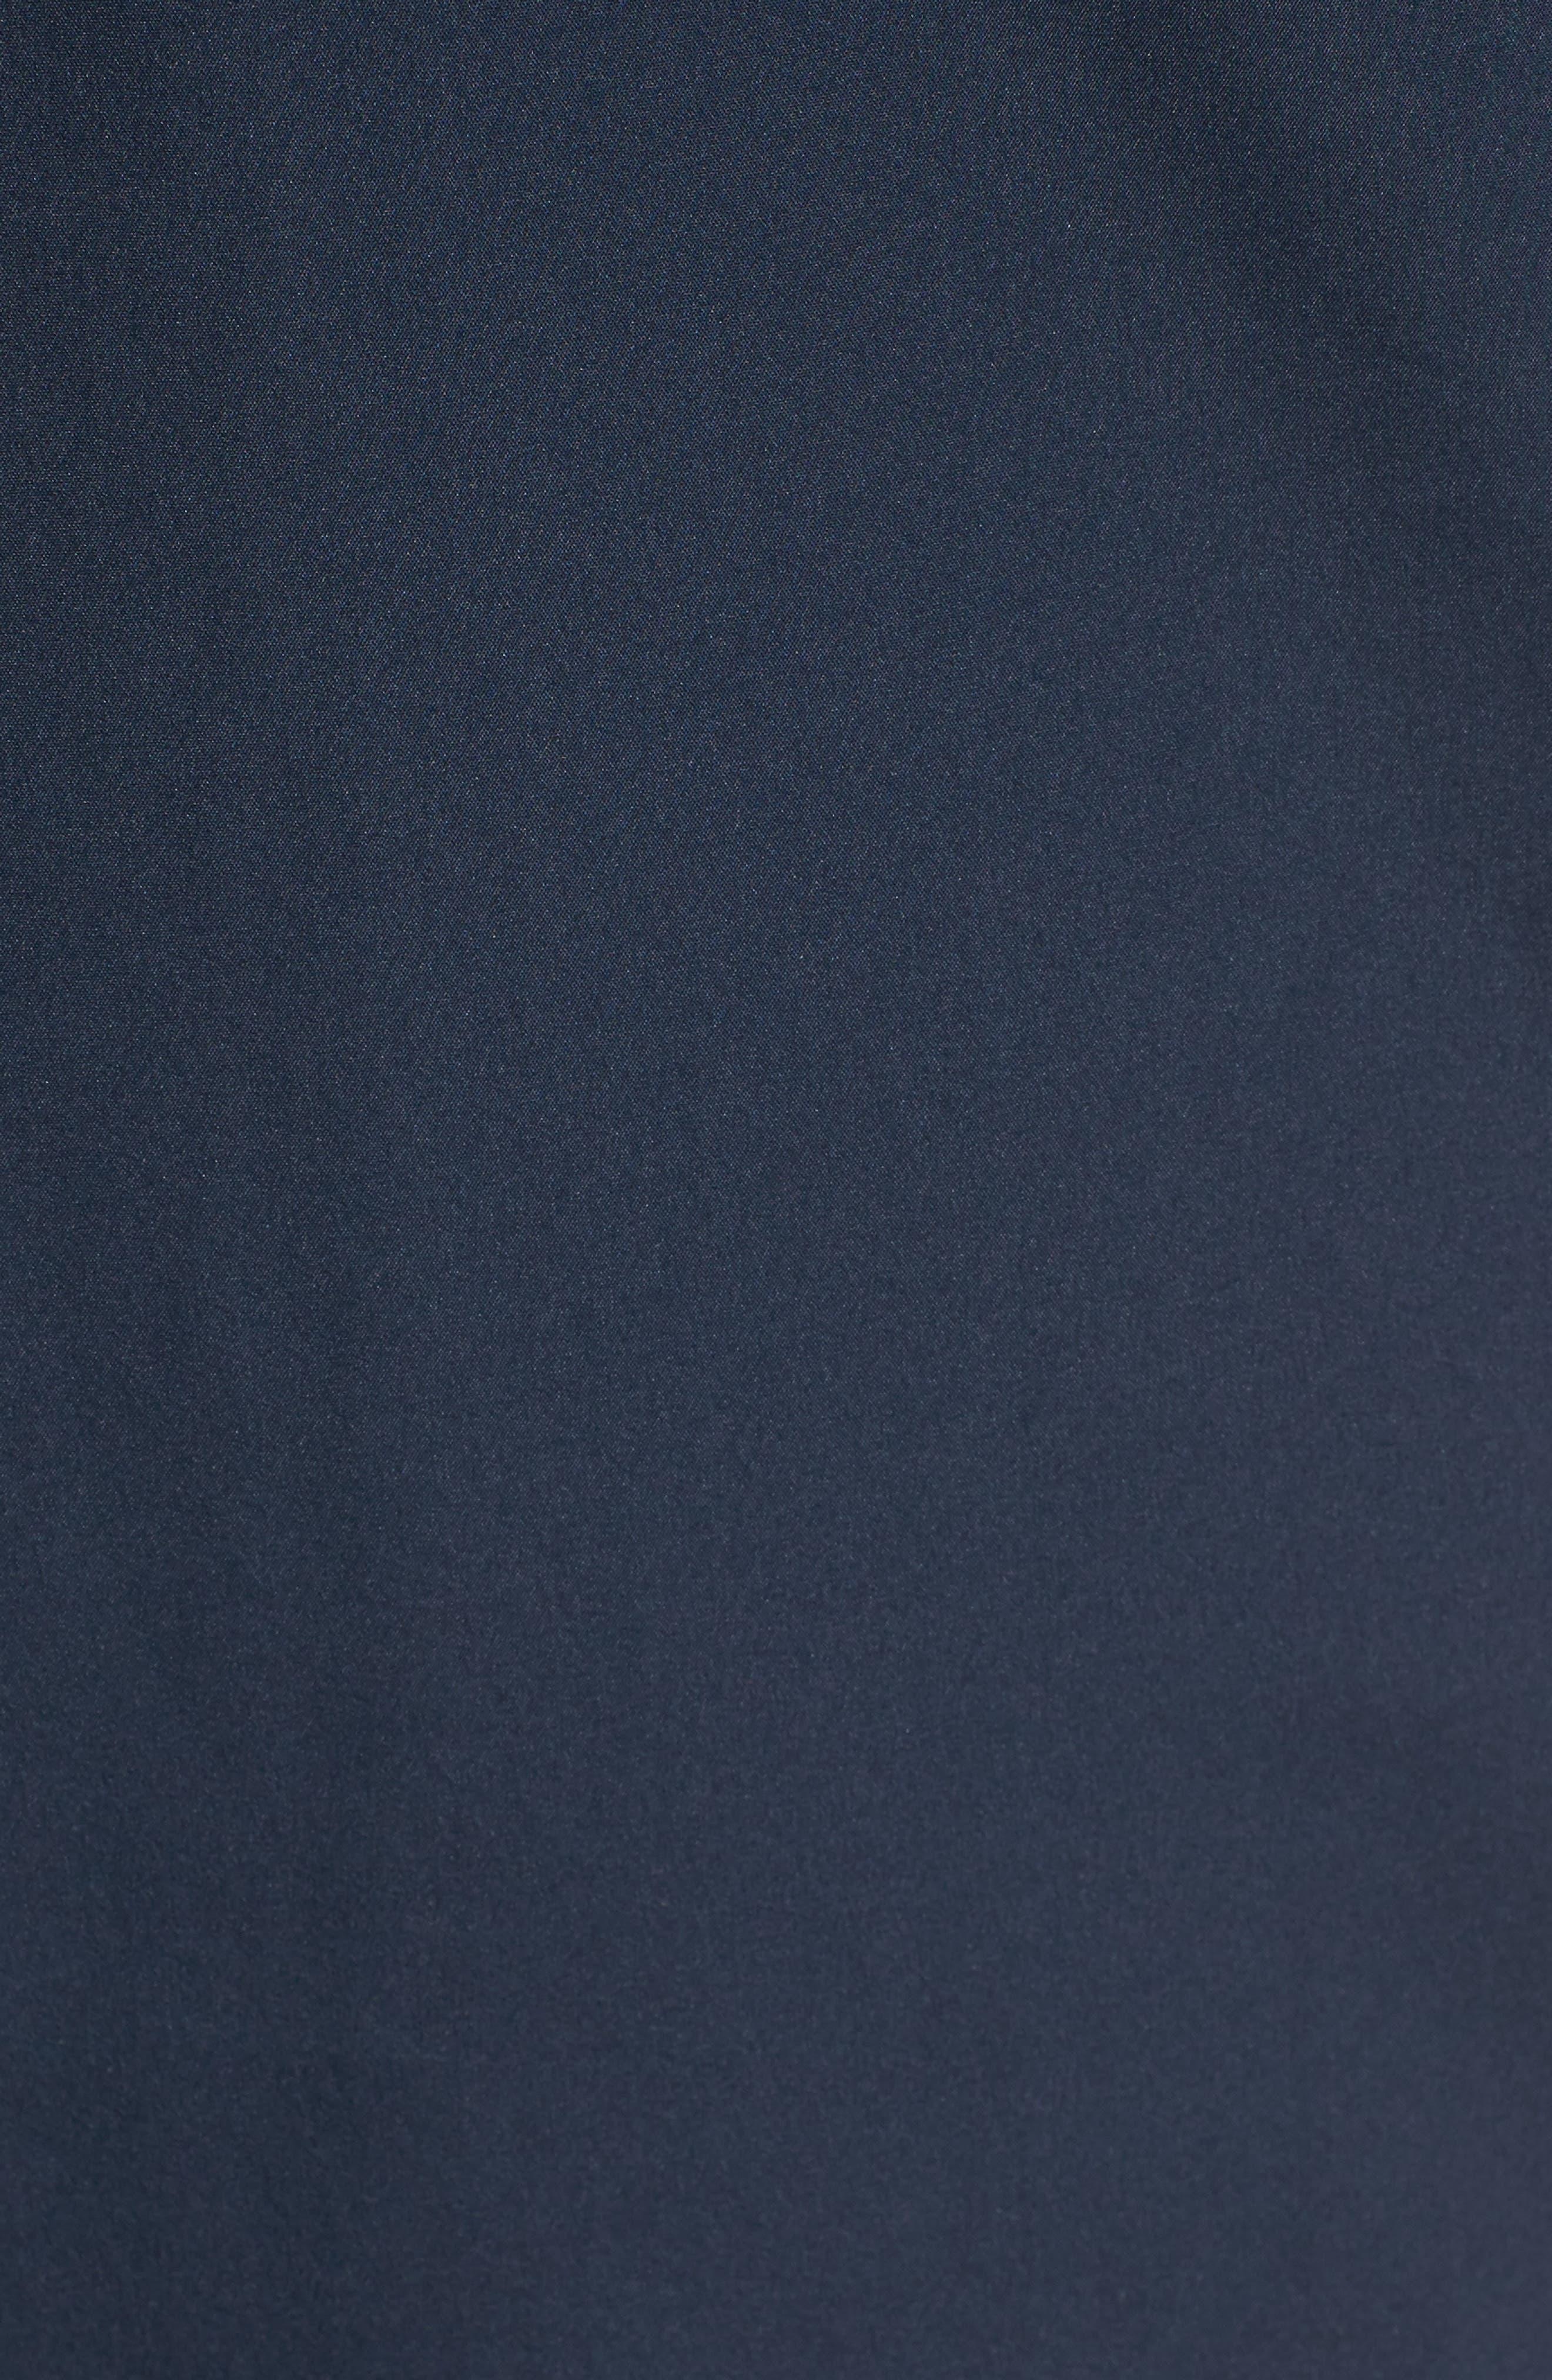 Hooded Jacket with Inset Fleece Bib,                             Alternate thumbnail 24, color,